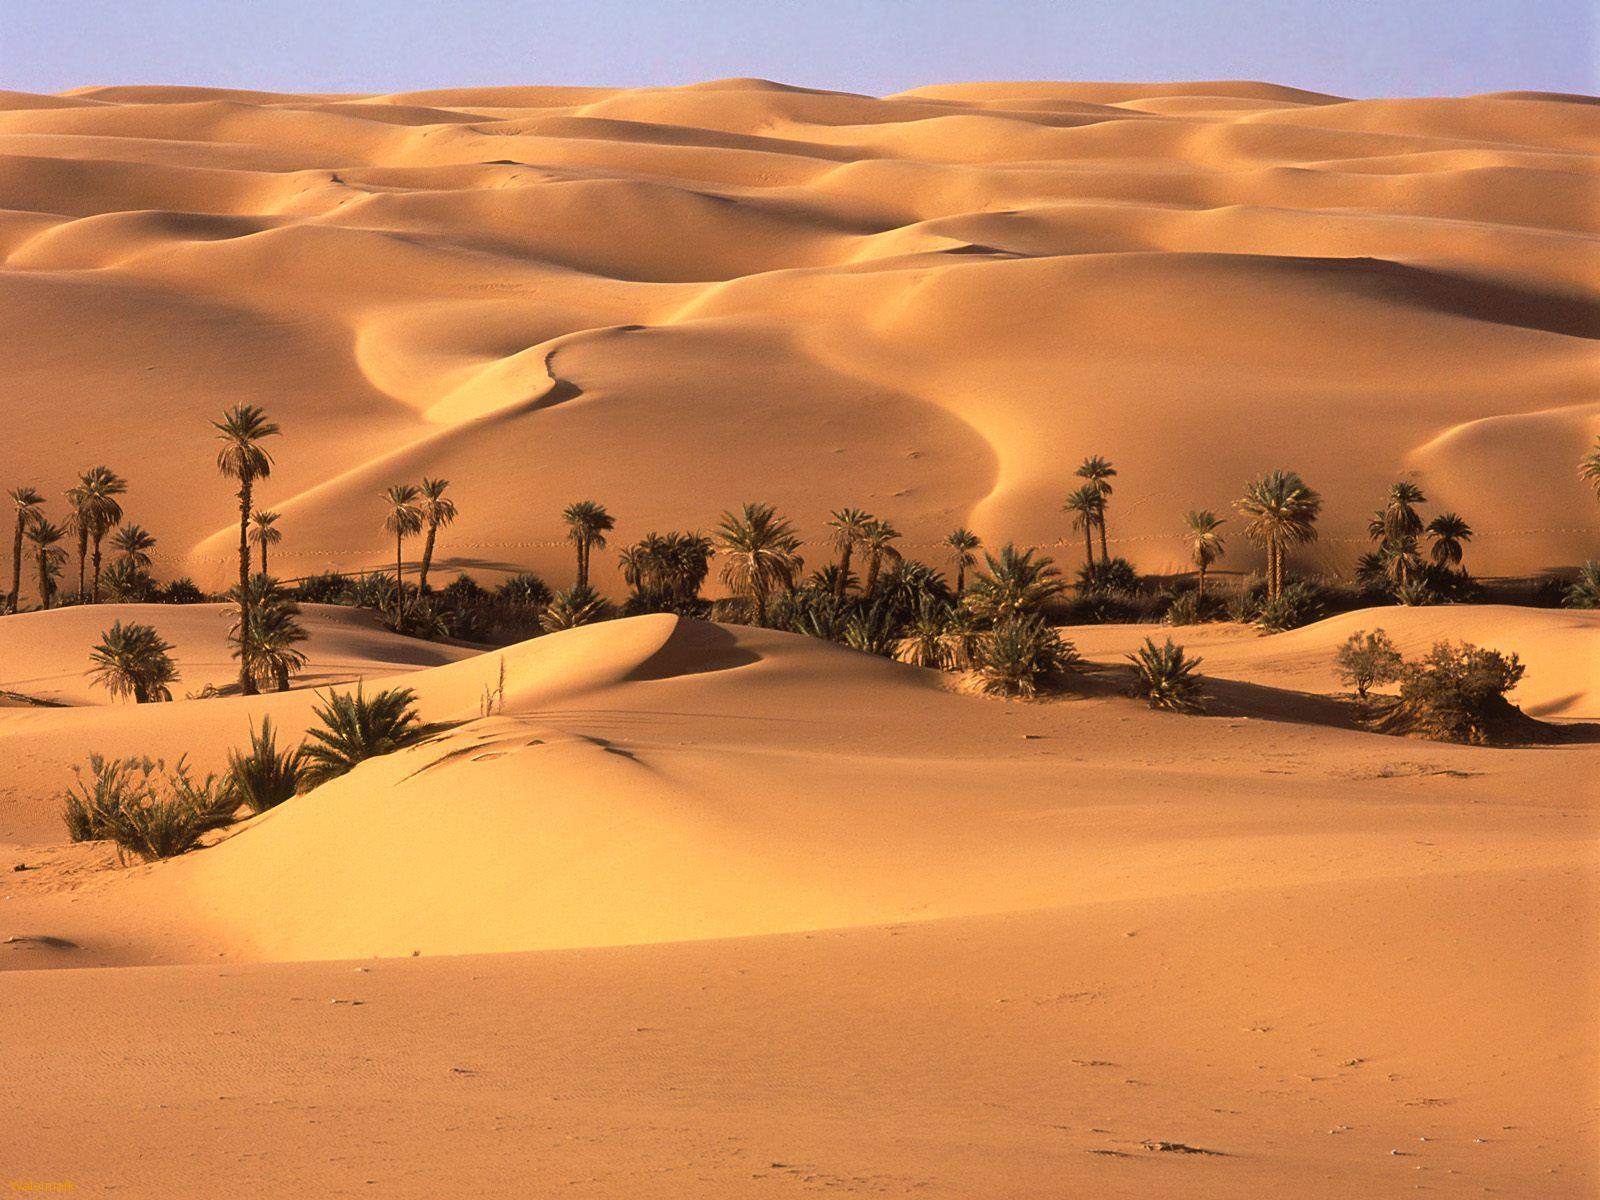 http://3.bp.blogspot.com/-6U2DmOrzE3k/TtouLHs9ddI/AAAAAAAABl0/JvKqxUSqgaQ/s1600/Oasis_Desierto_de_Libia-430167.jpeg